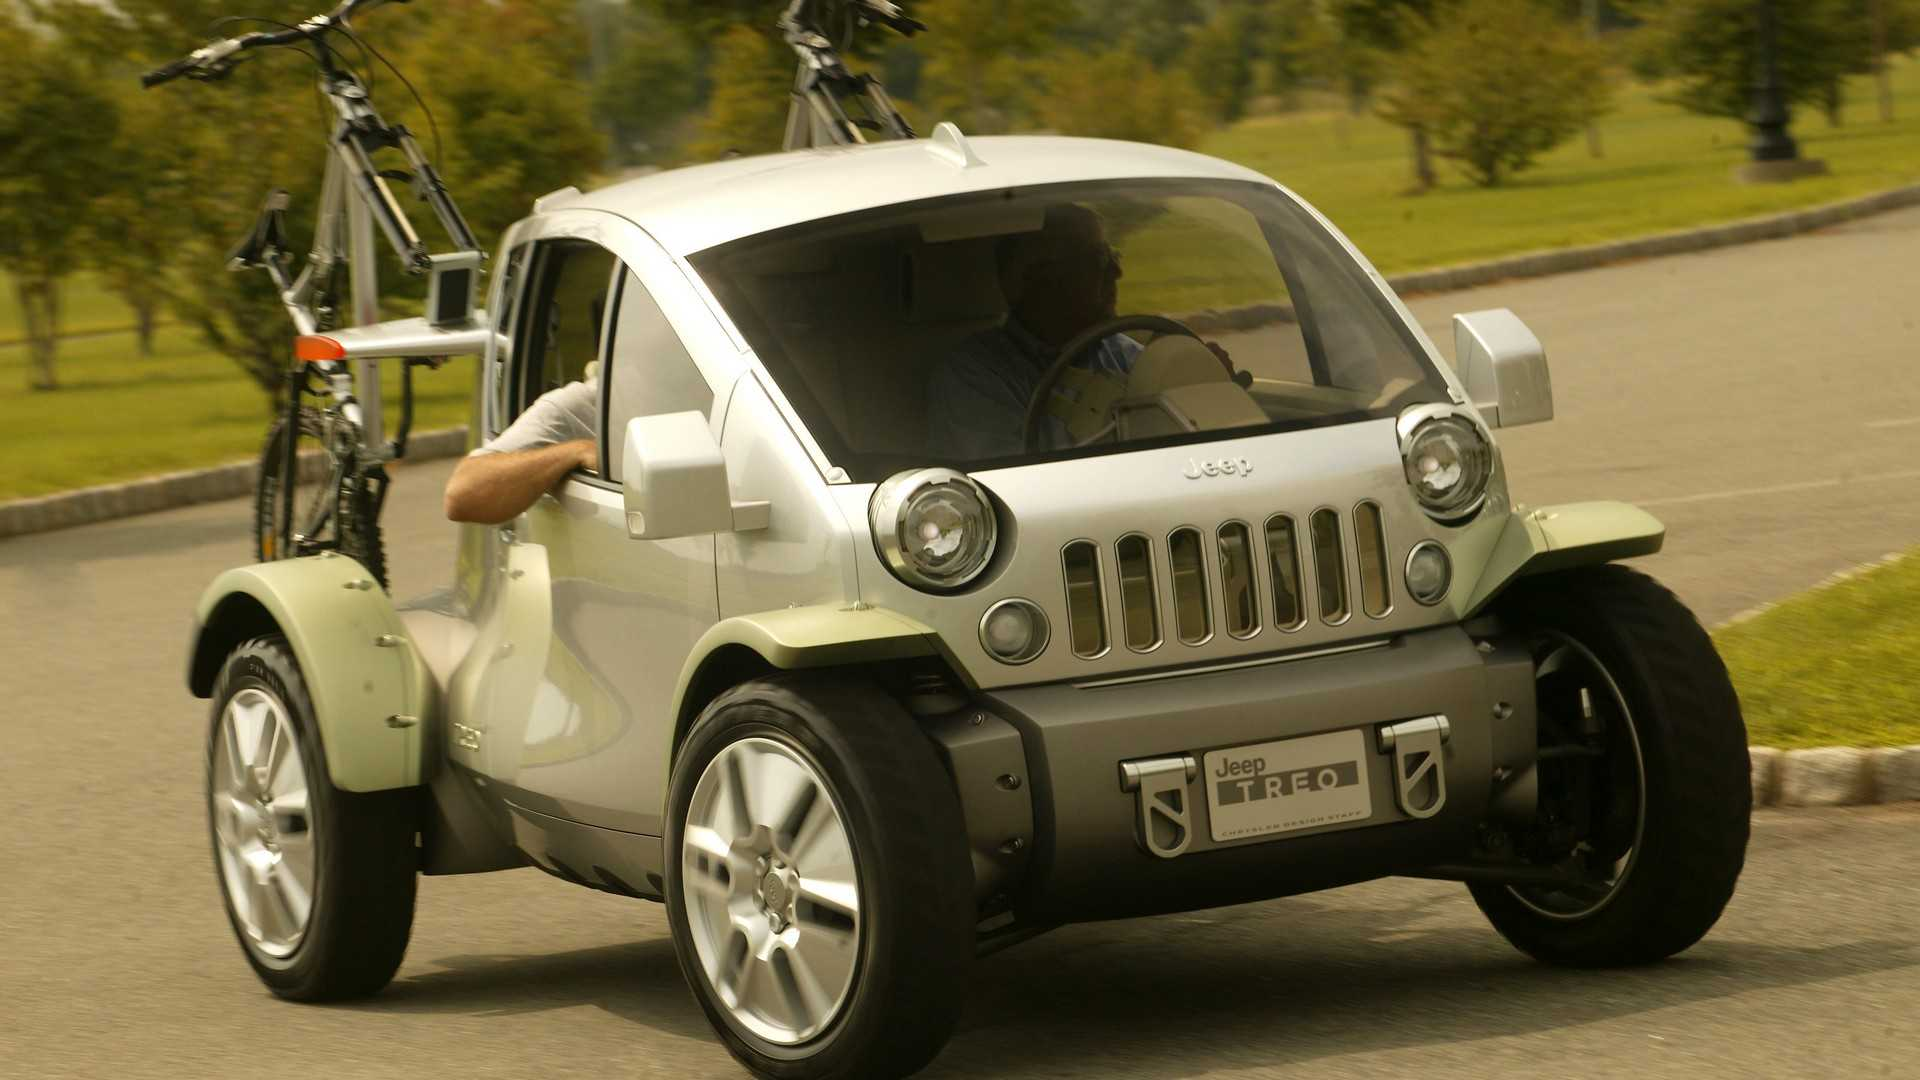 Jeep Treo concept 2003 (5)